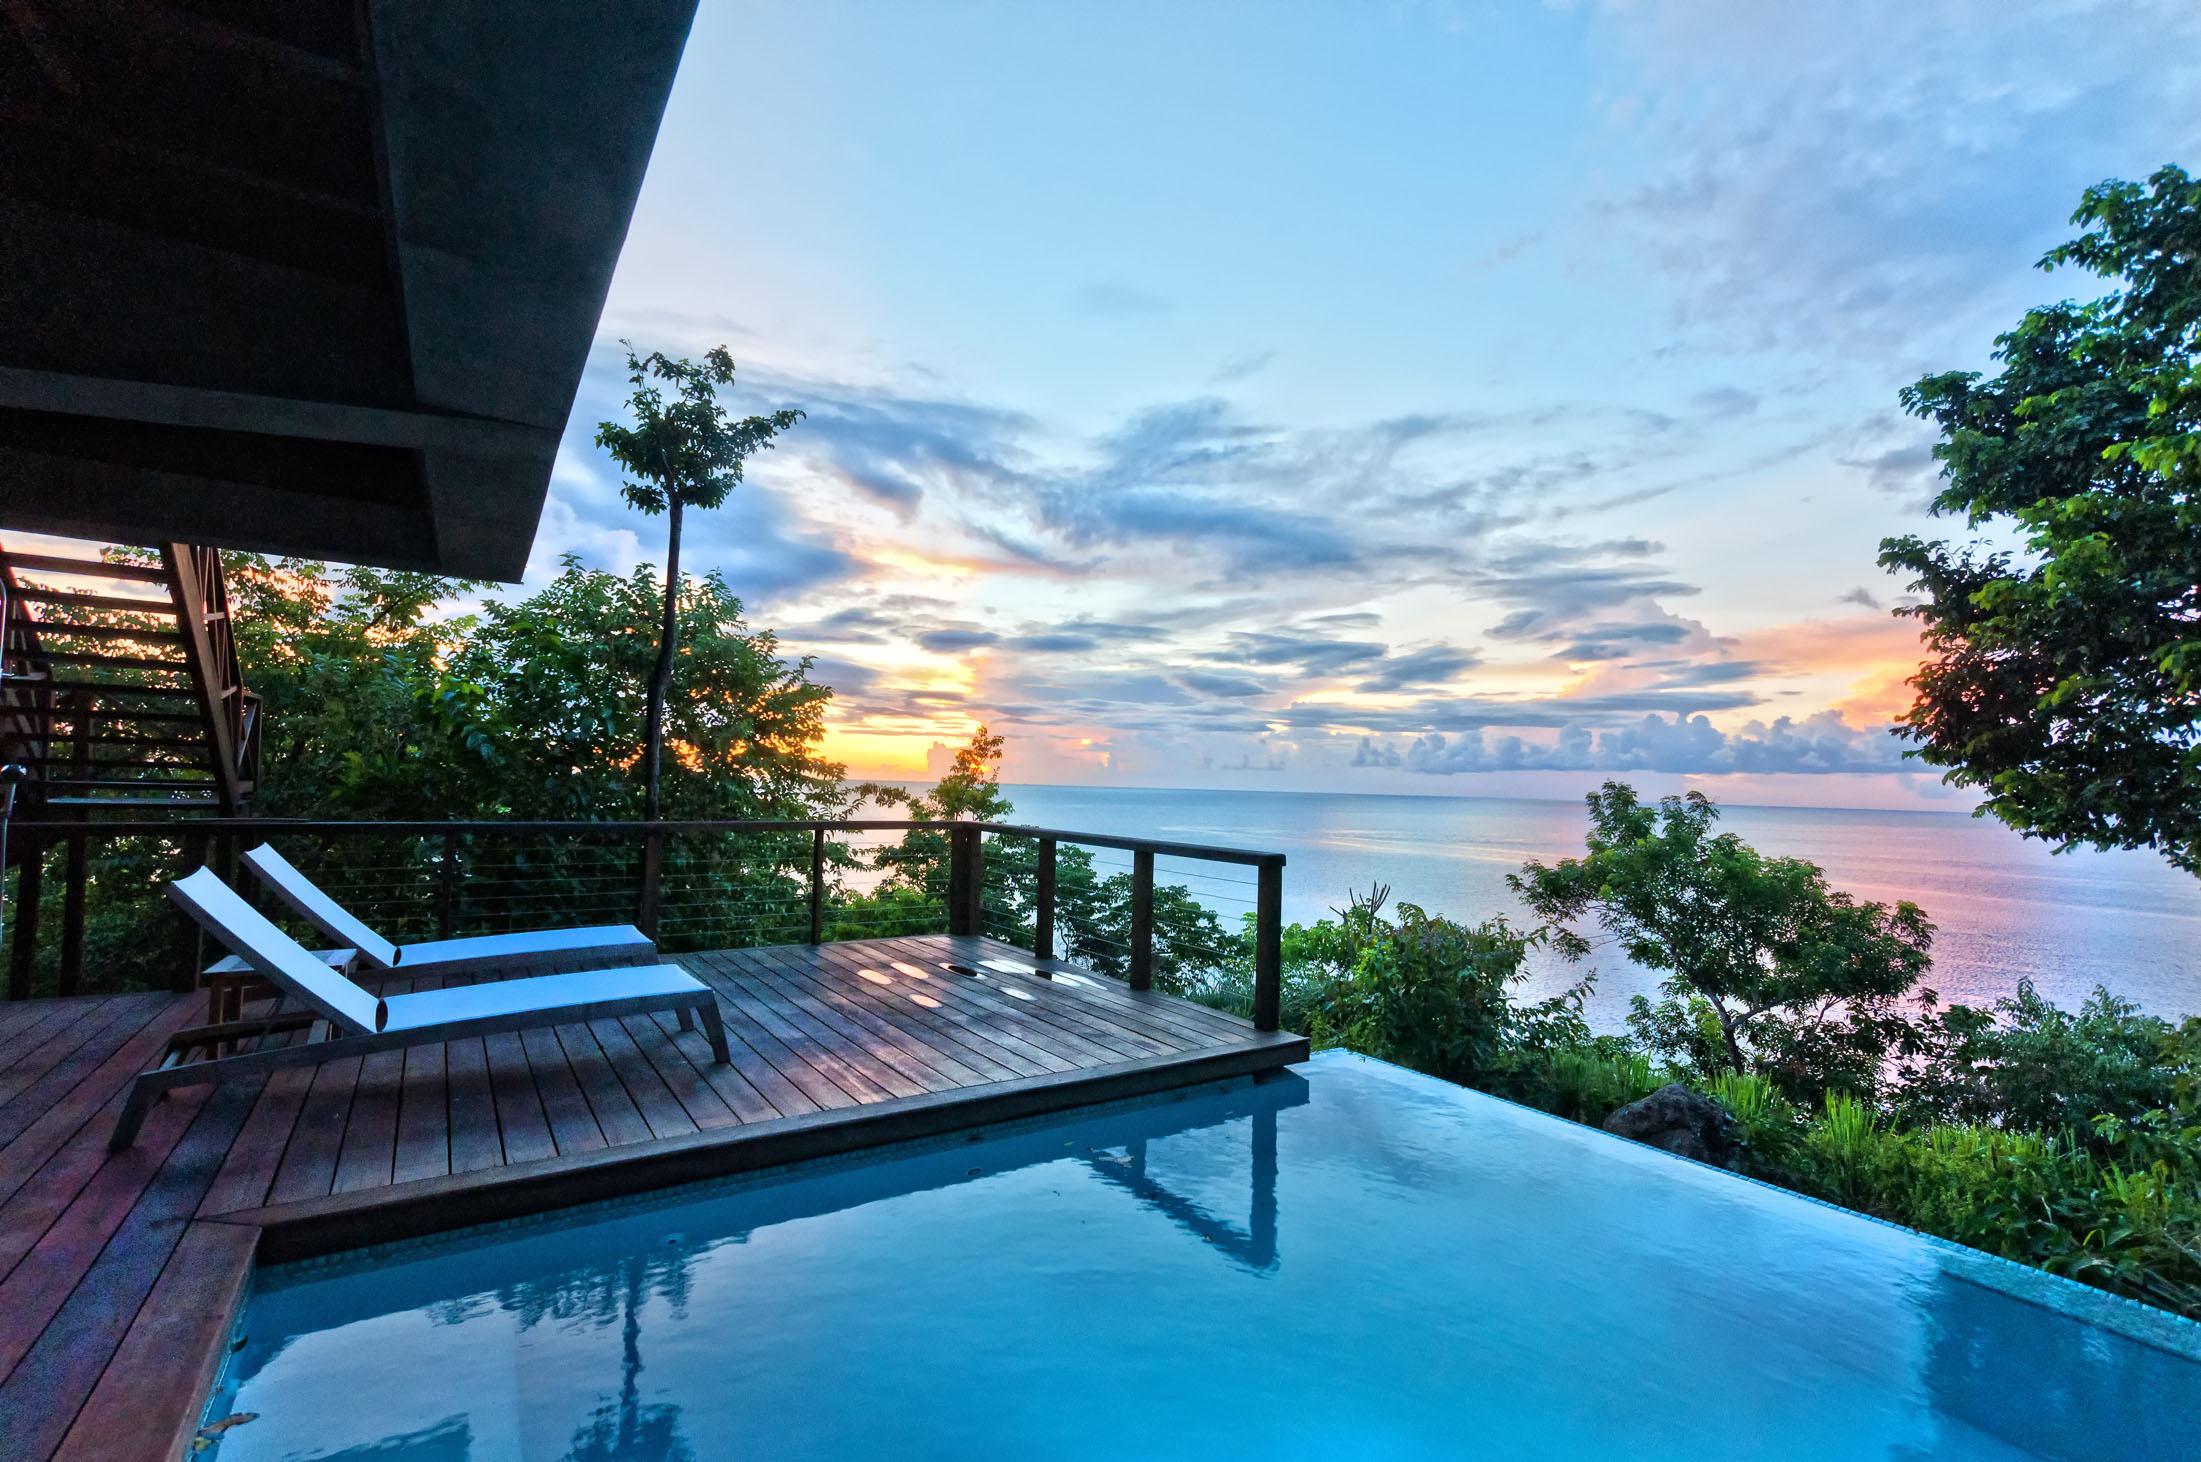 3.Caribbean